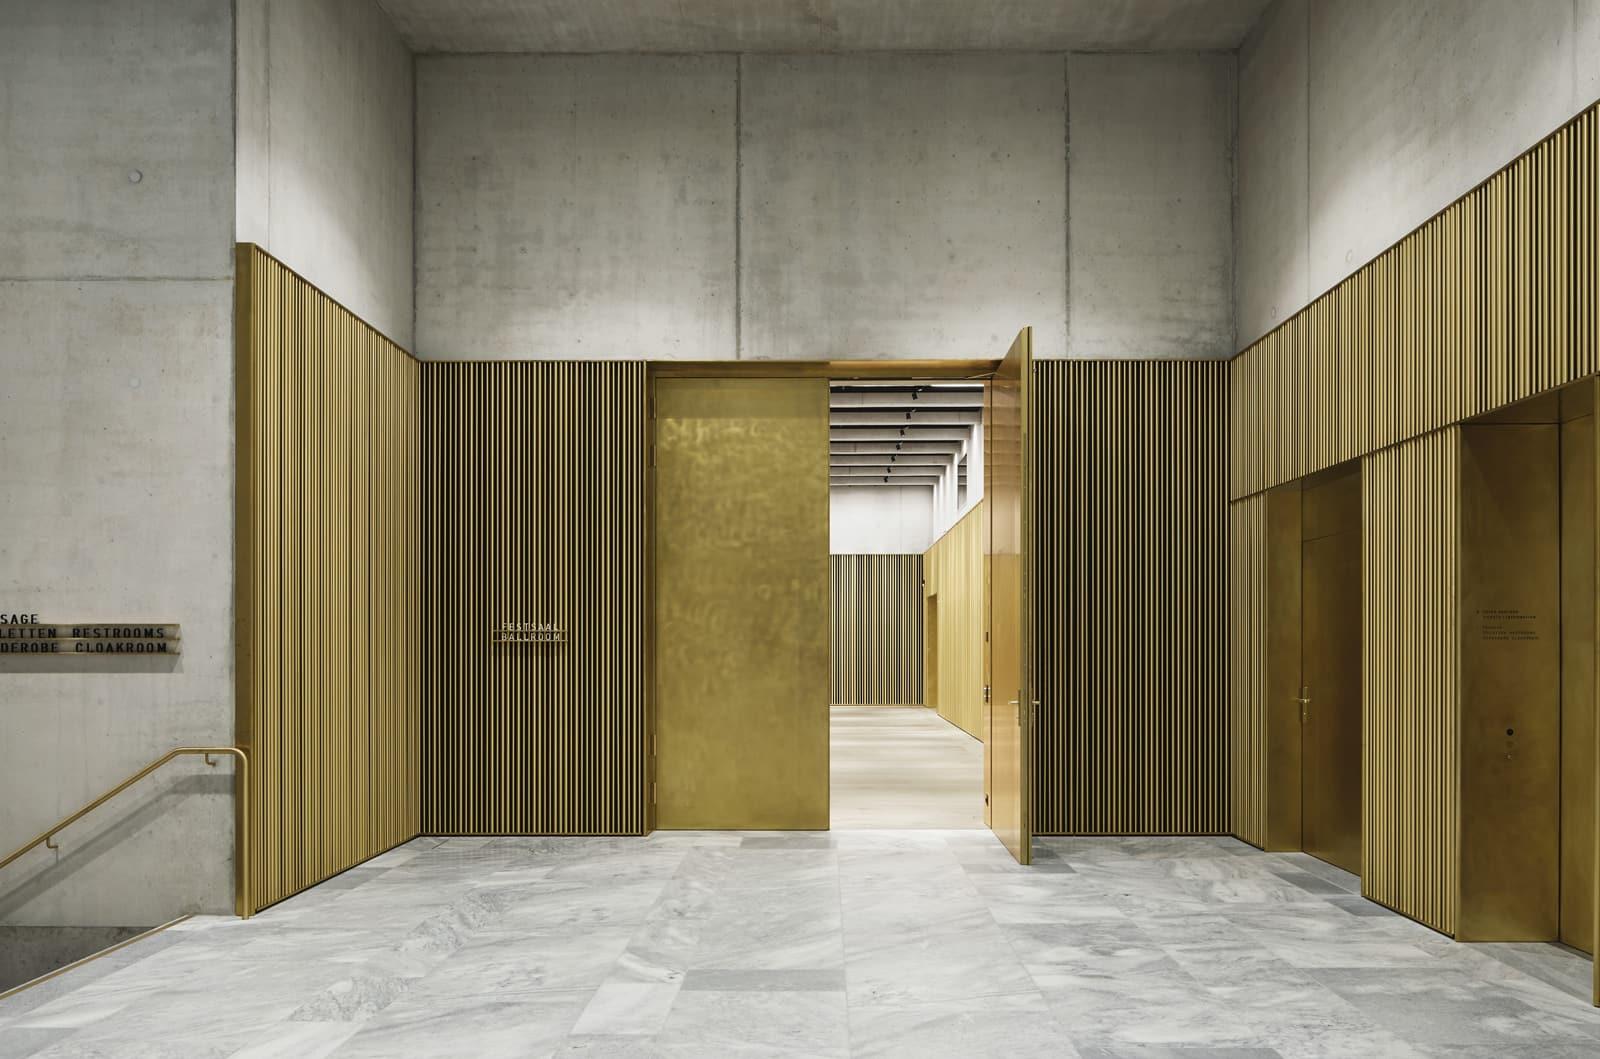 Kunsthaus Zürich  - 20210712 Chipperfield Kunsthaus 05 41